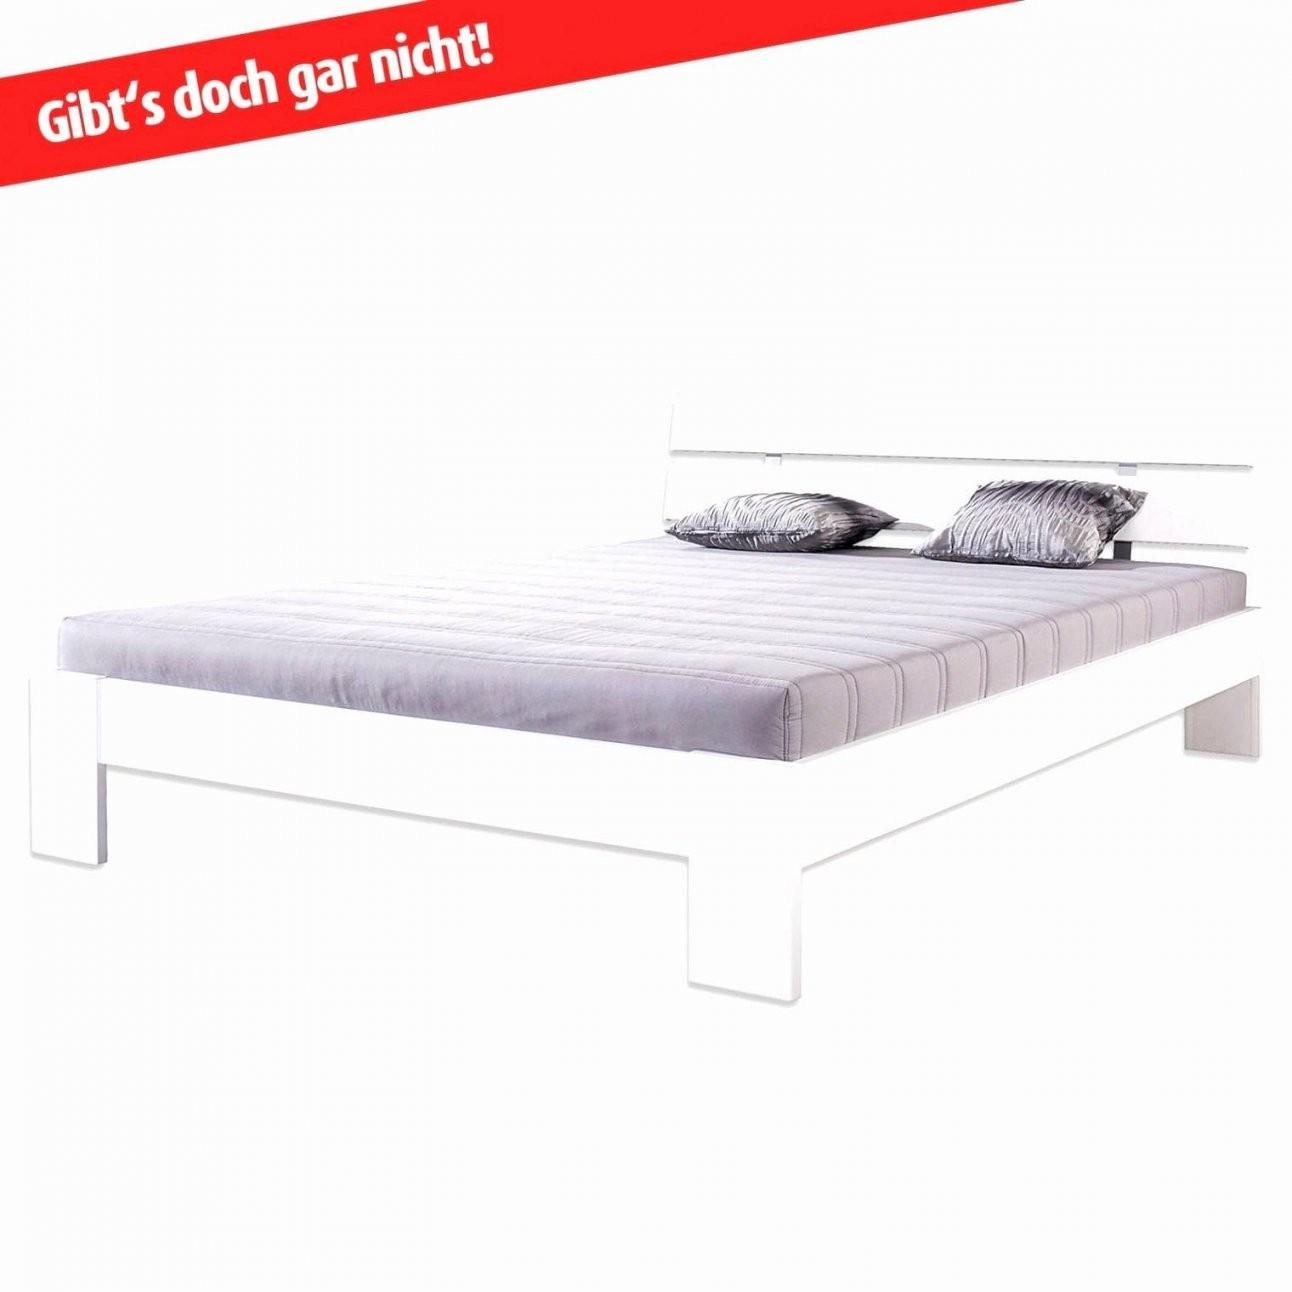 Kingsize Matras Nieuw Bett Massivholz 180×200 Neu Bett 180×200 Ikea von Ikea Betten 180X200 Photo